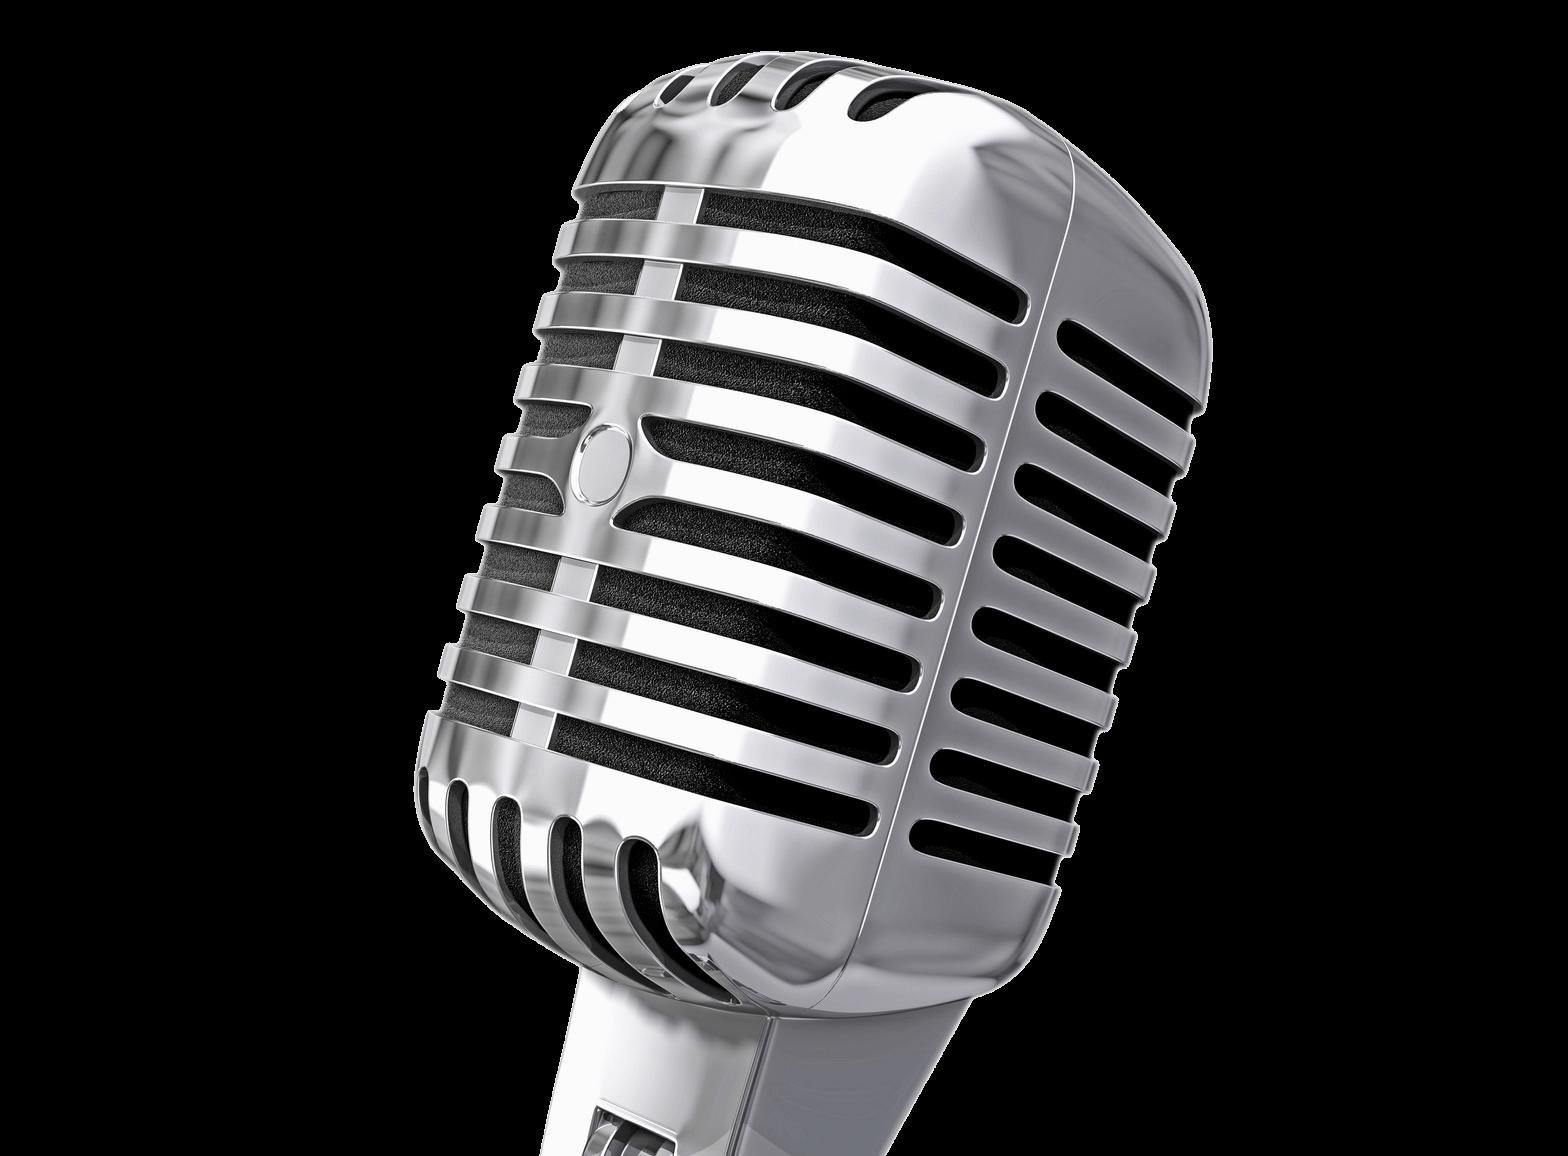 1568x1156 Vintage Microphone Transparent Png